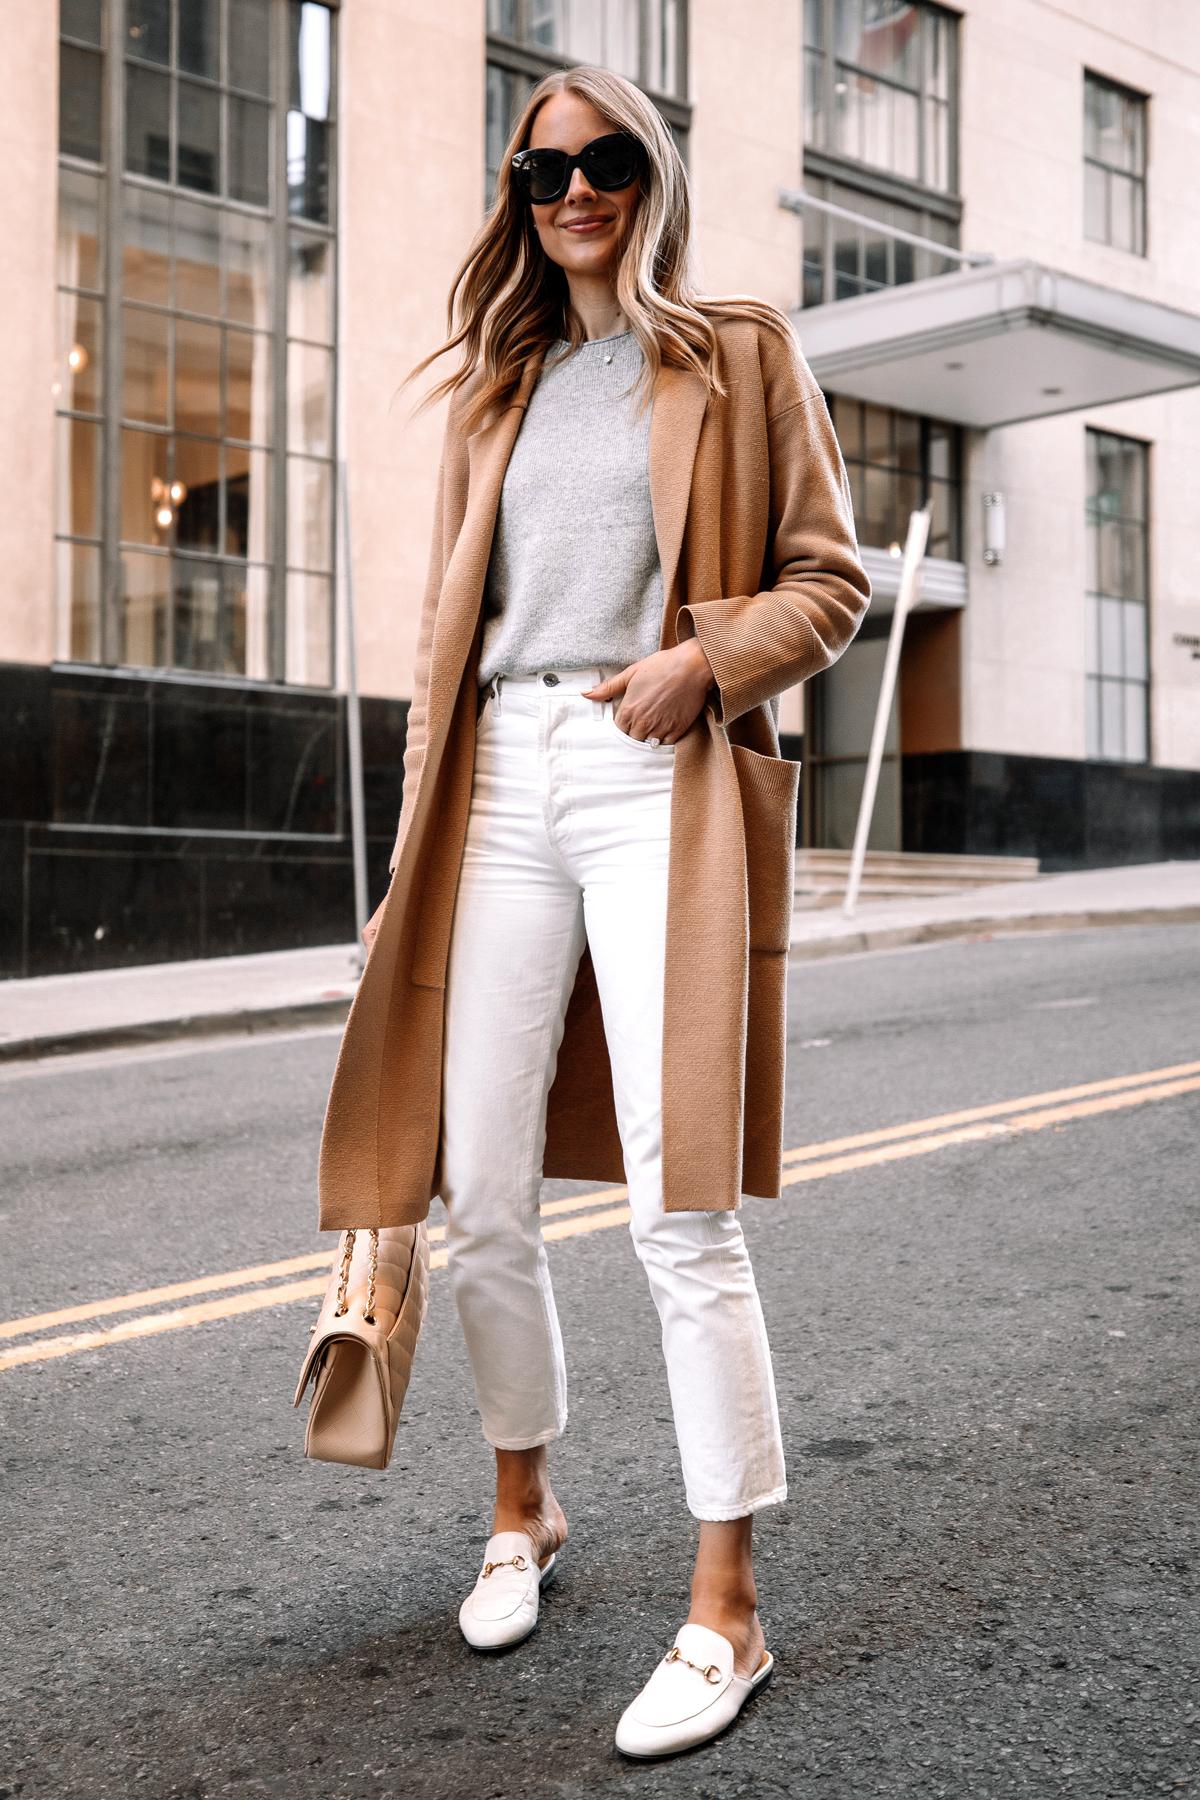 Fashion Jackson Wearing Tan Cardigan Grey Sweater White Jeans White Gucci Princetown Mules Street Style